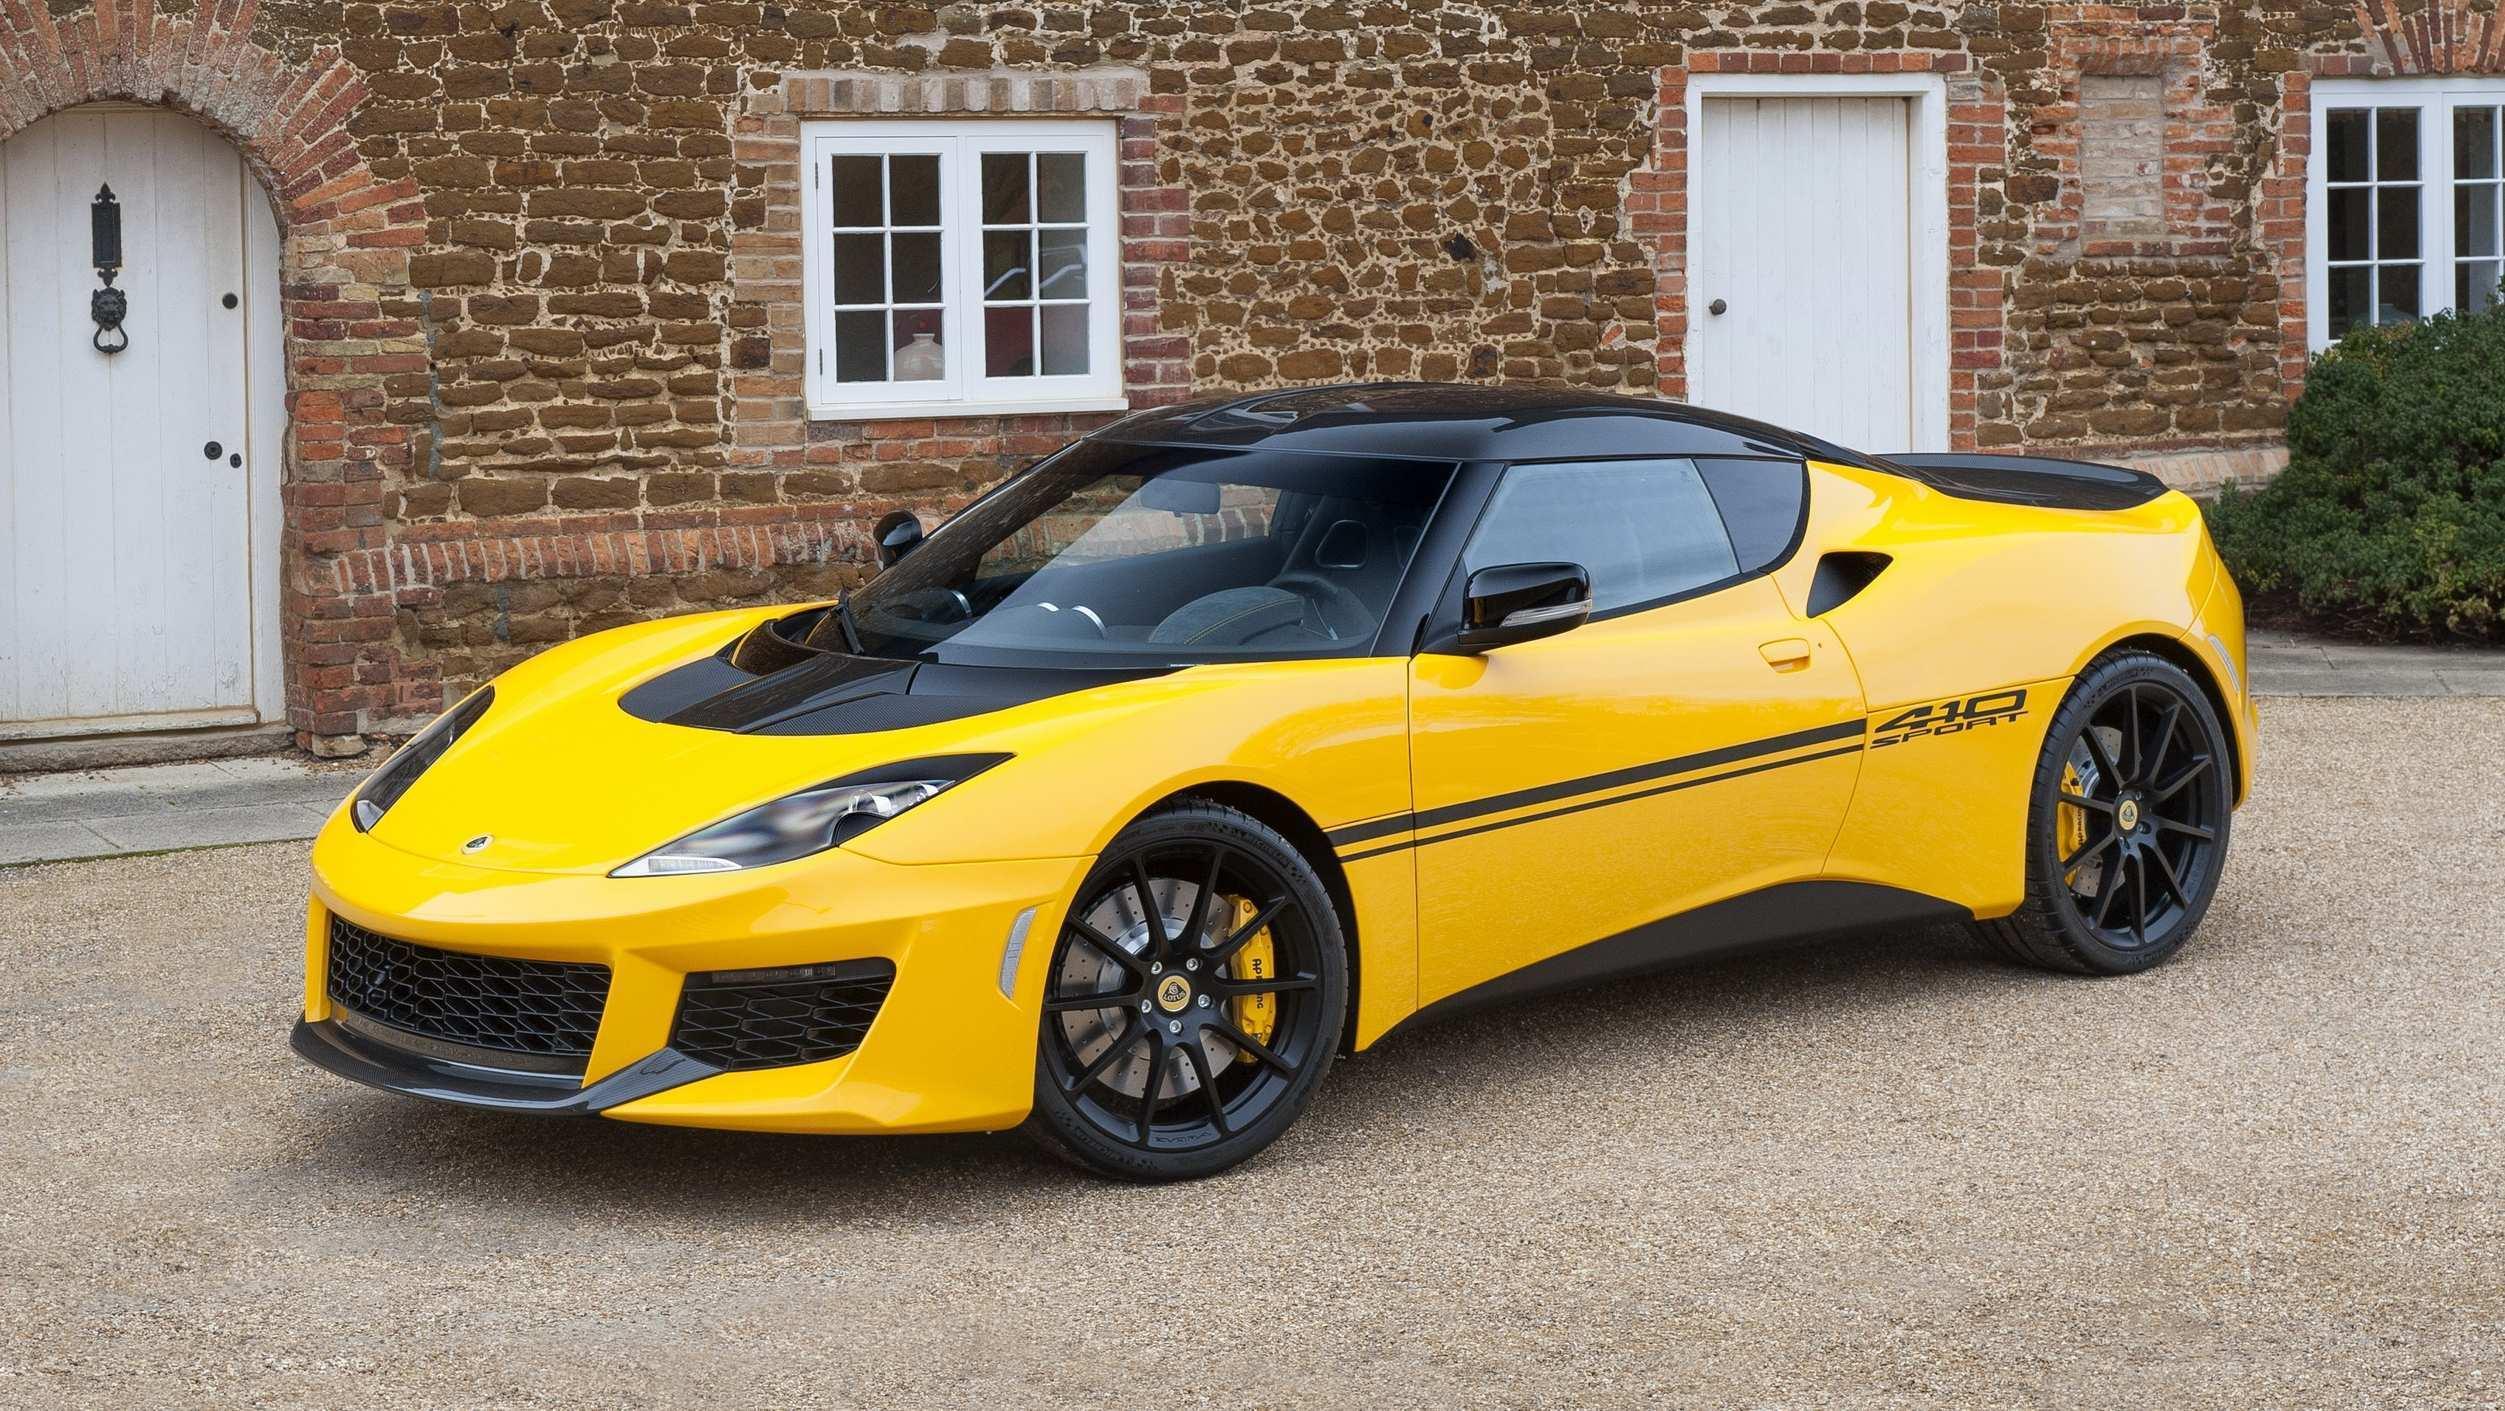 27 Great 2020 Lotus Evora Configurations for 2020 Lotus Evora